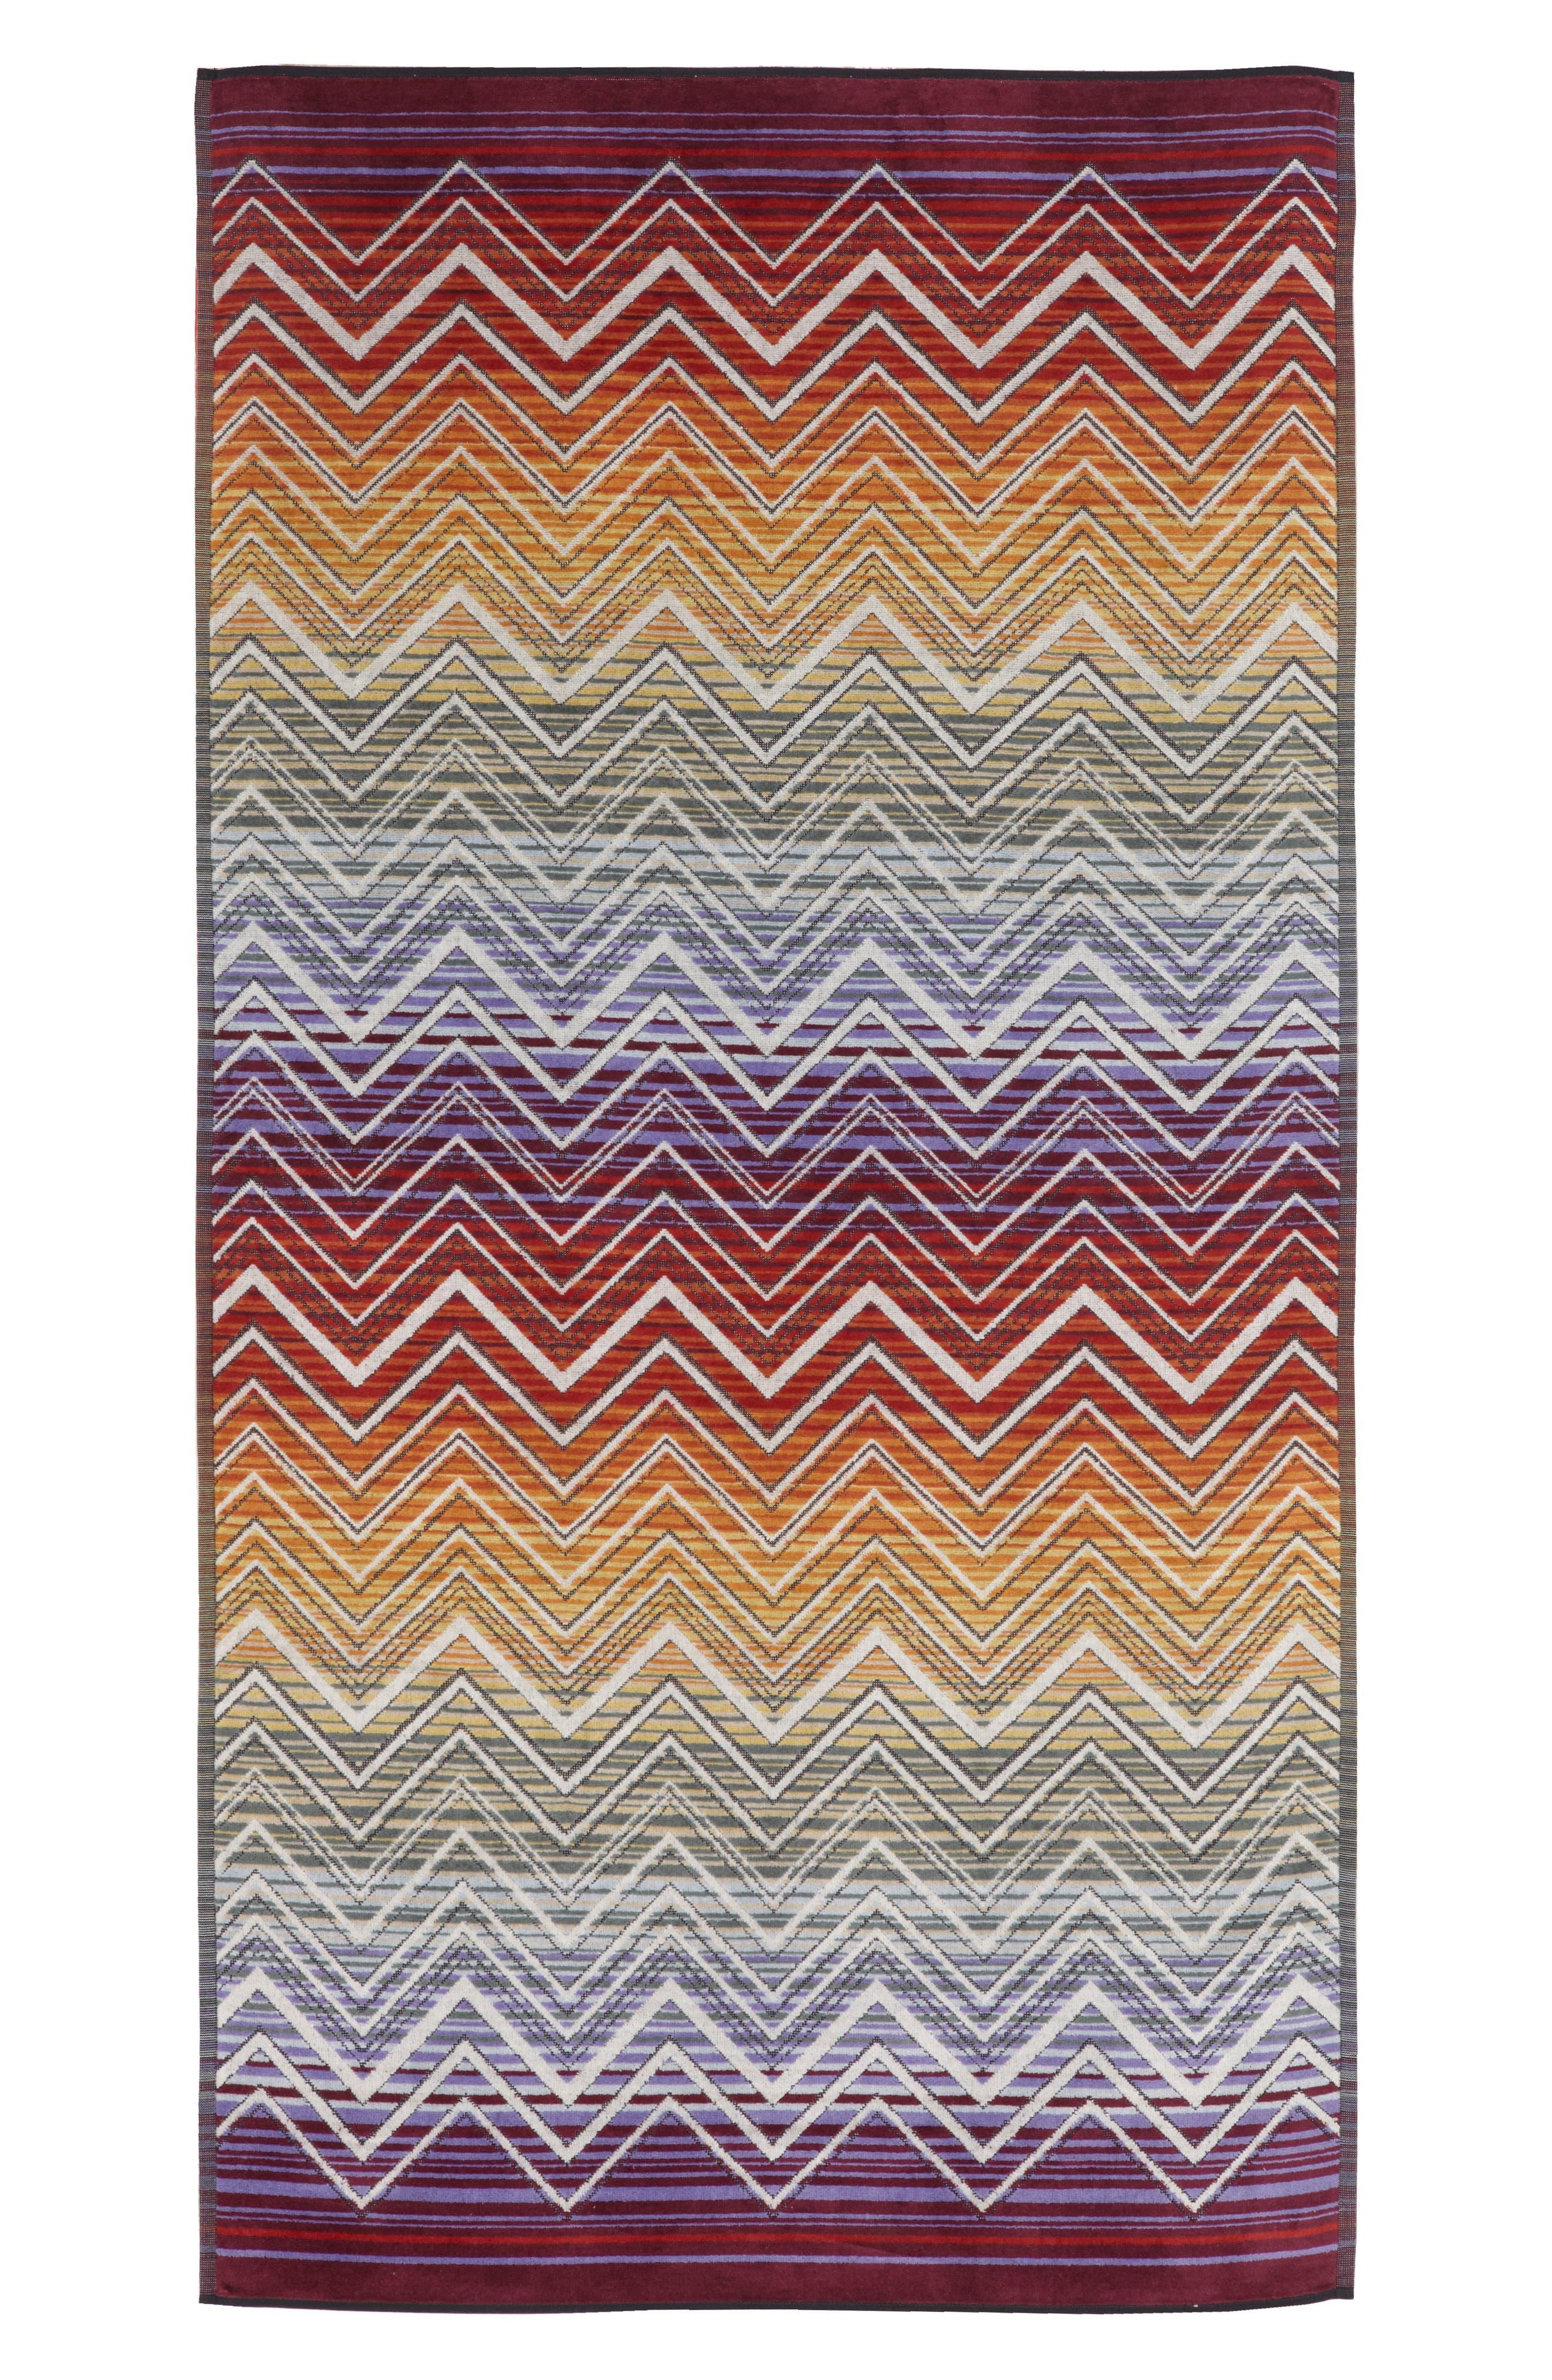 Tolomeo Hand Towel,                         Main,                         color, 600